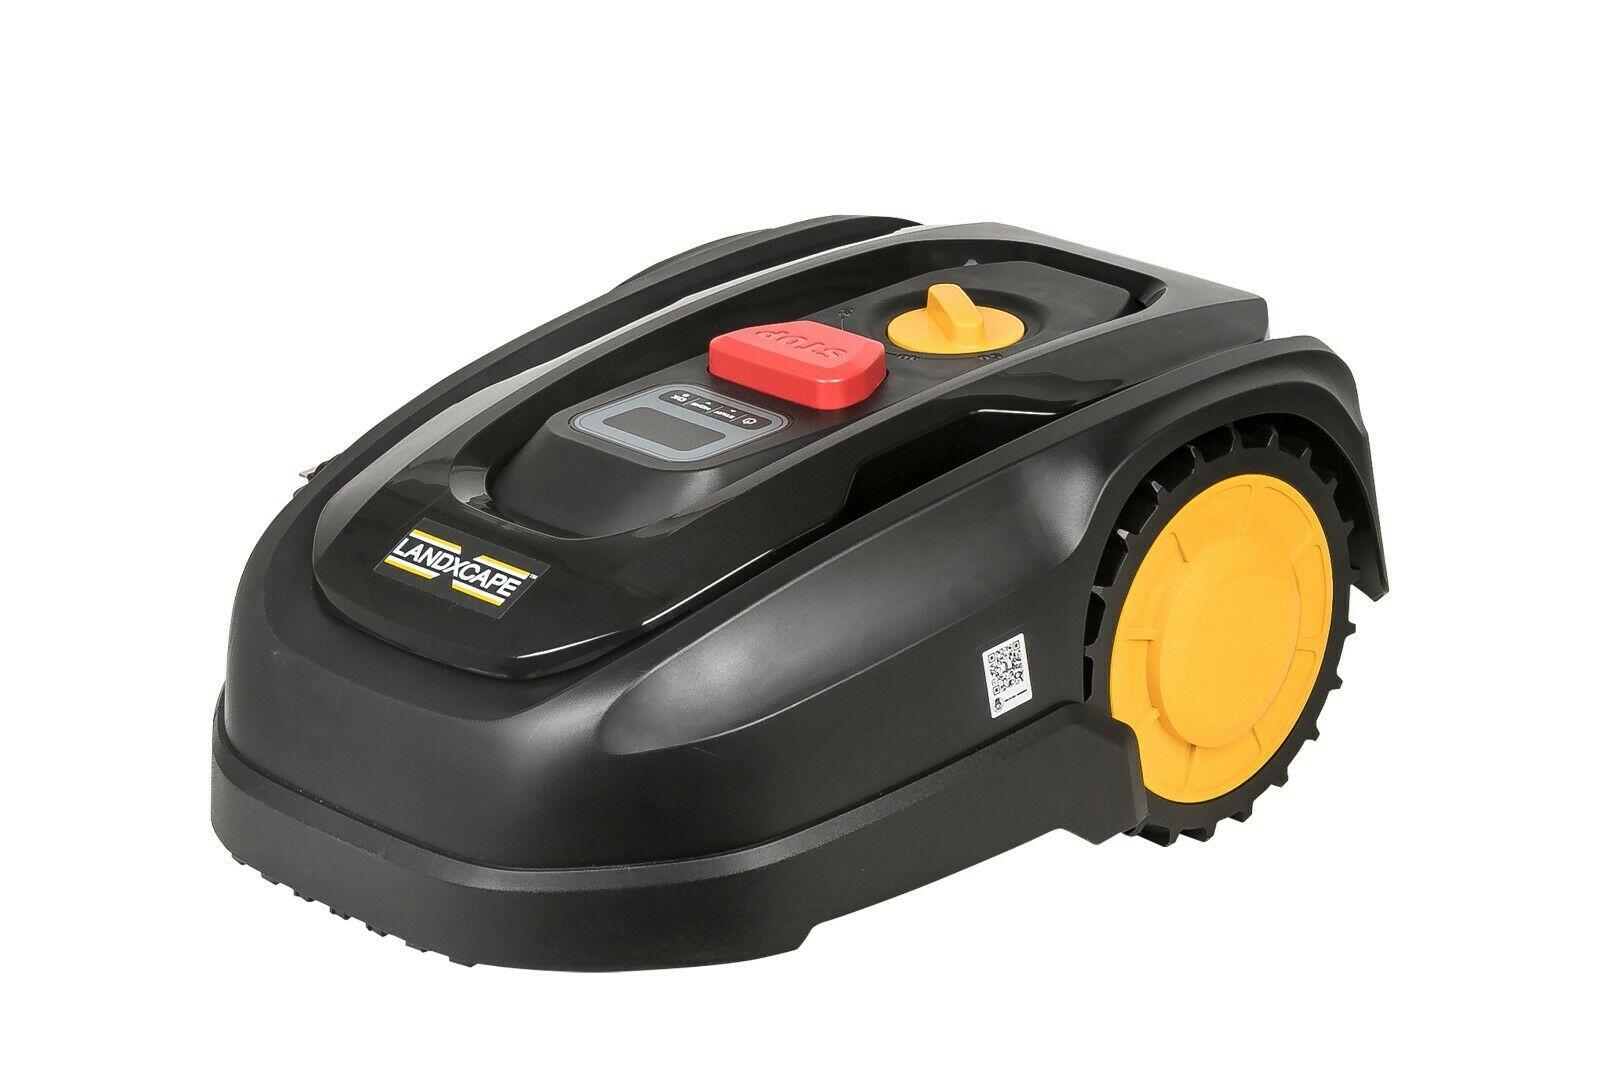 LANDXCAPE LX799 300m2 Robotic LawnMower - £249.99 @ WORX / Ebay